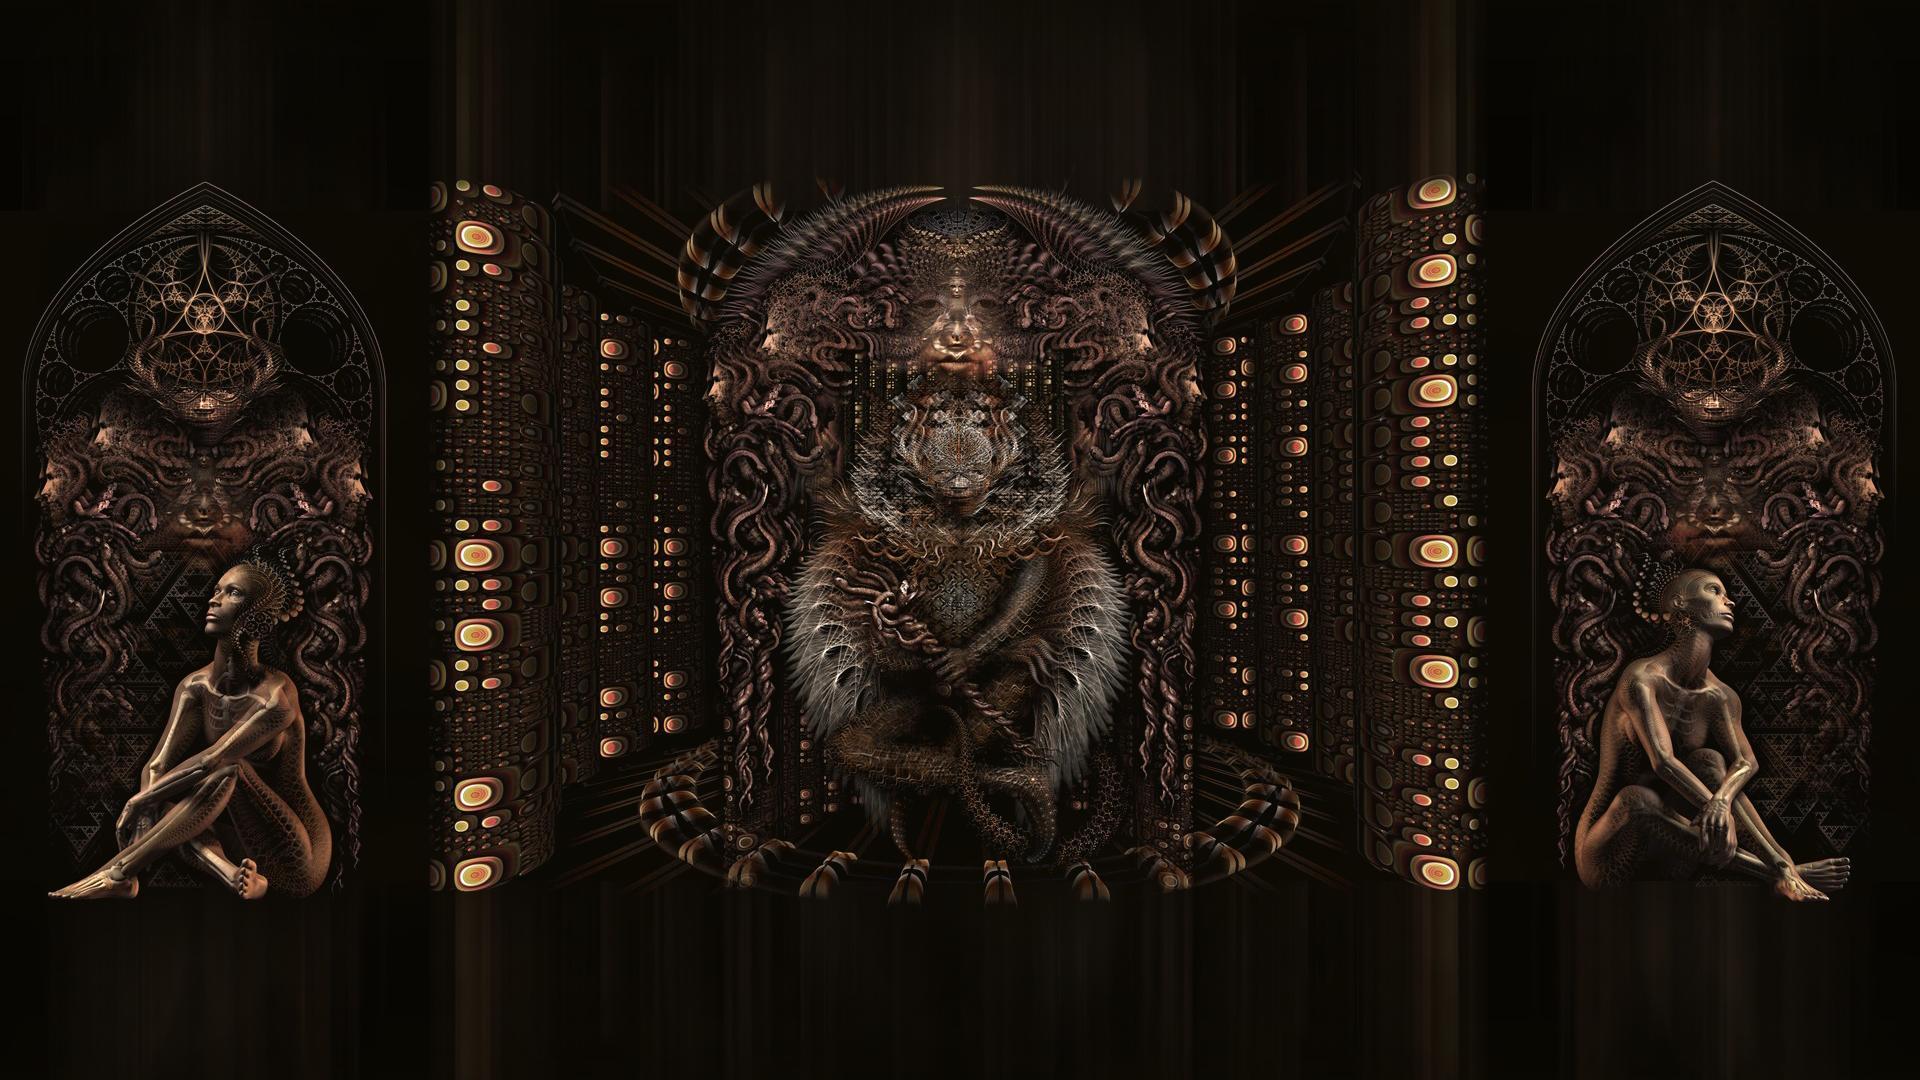 Koloss   Meshuggah Album Art [1920 x 1080] pikdit 1920x1080